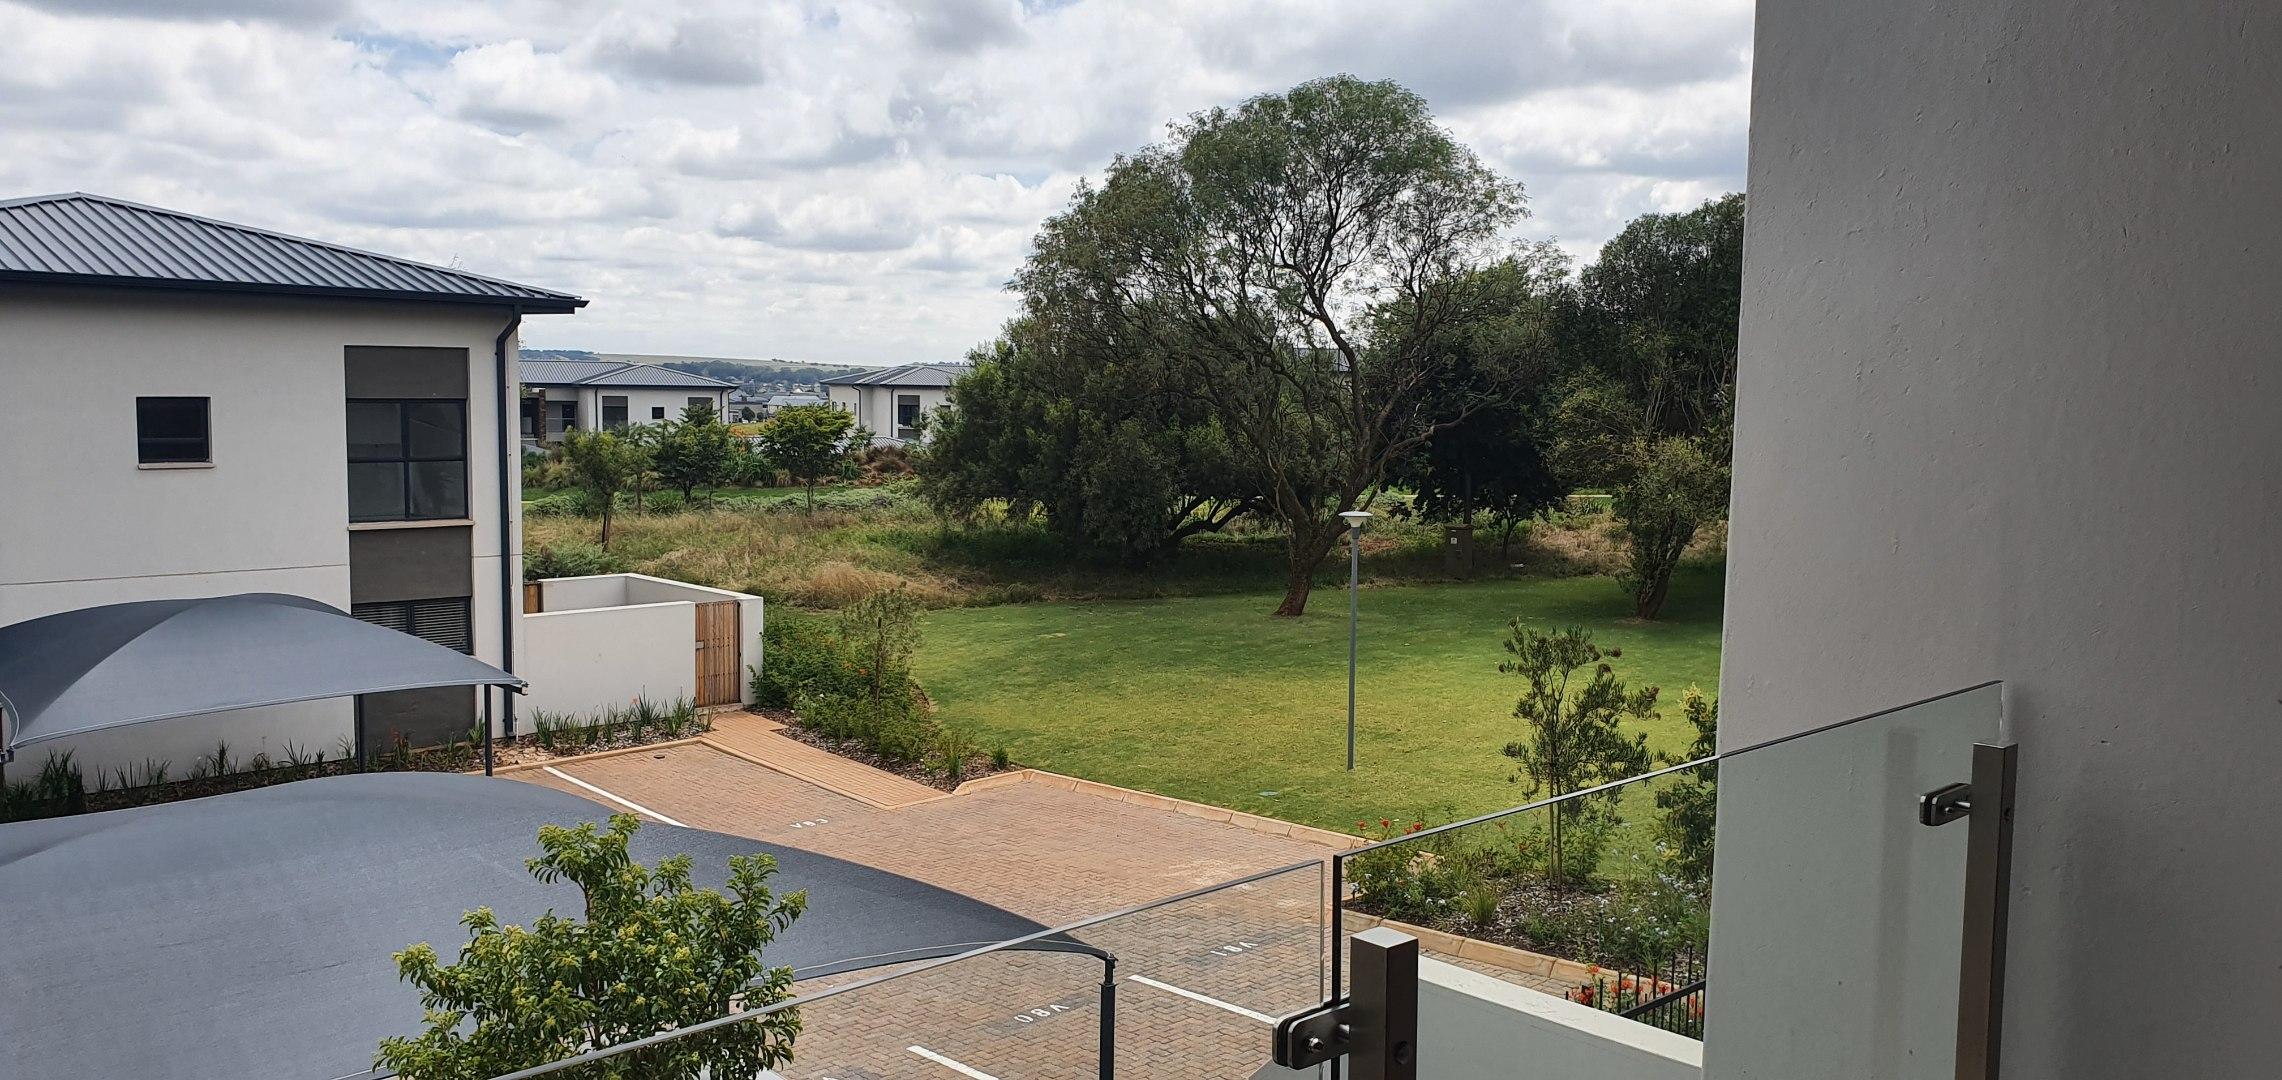 2 Bedroom Apartment / Flat To Rent in Serengeti Lifestyle Estate